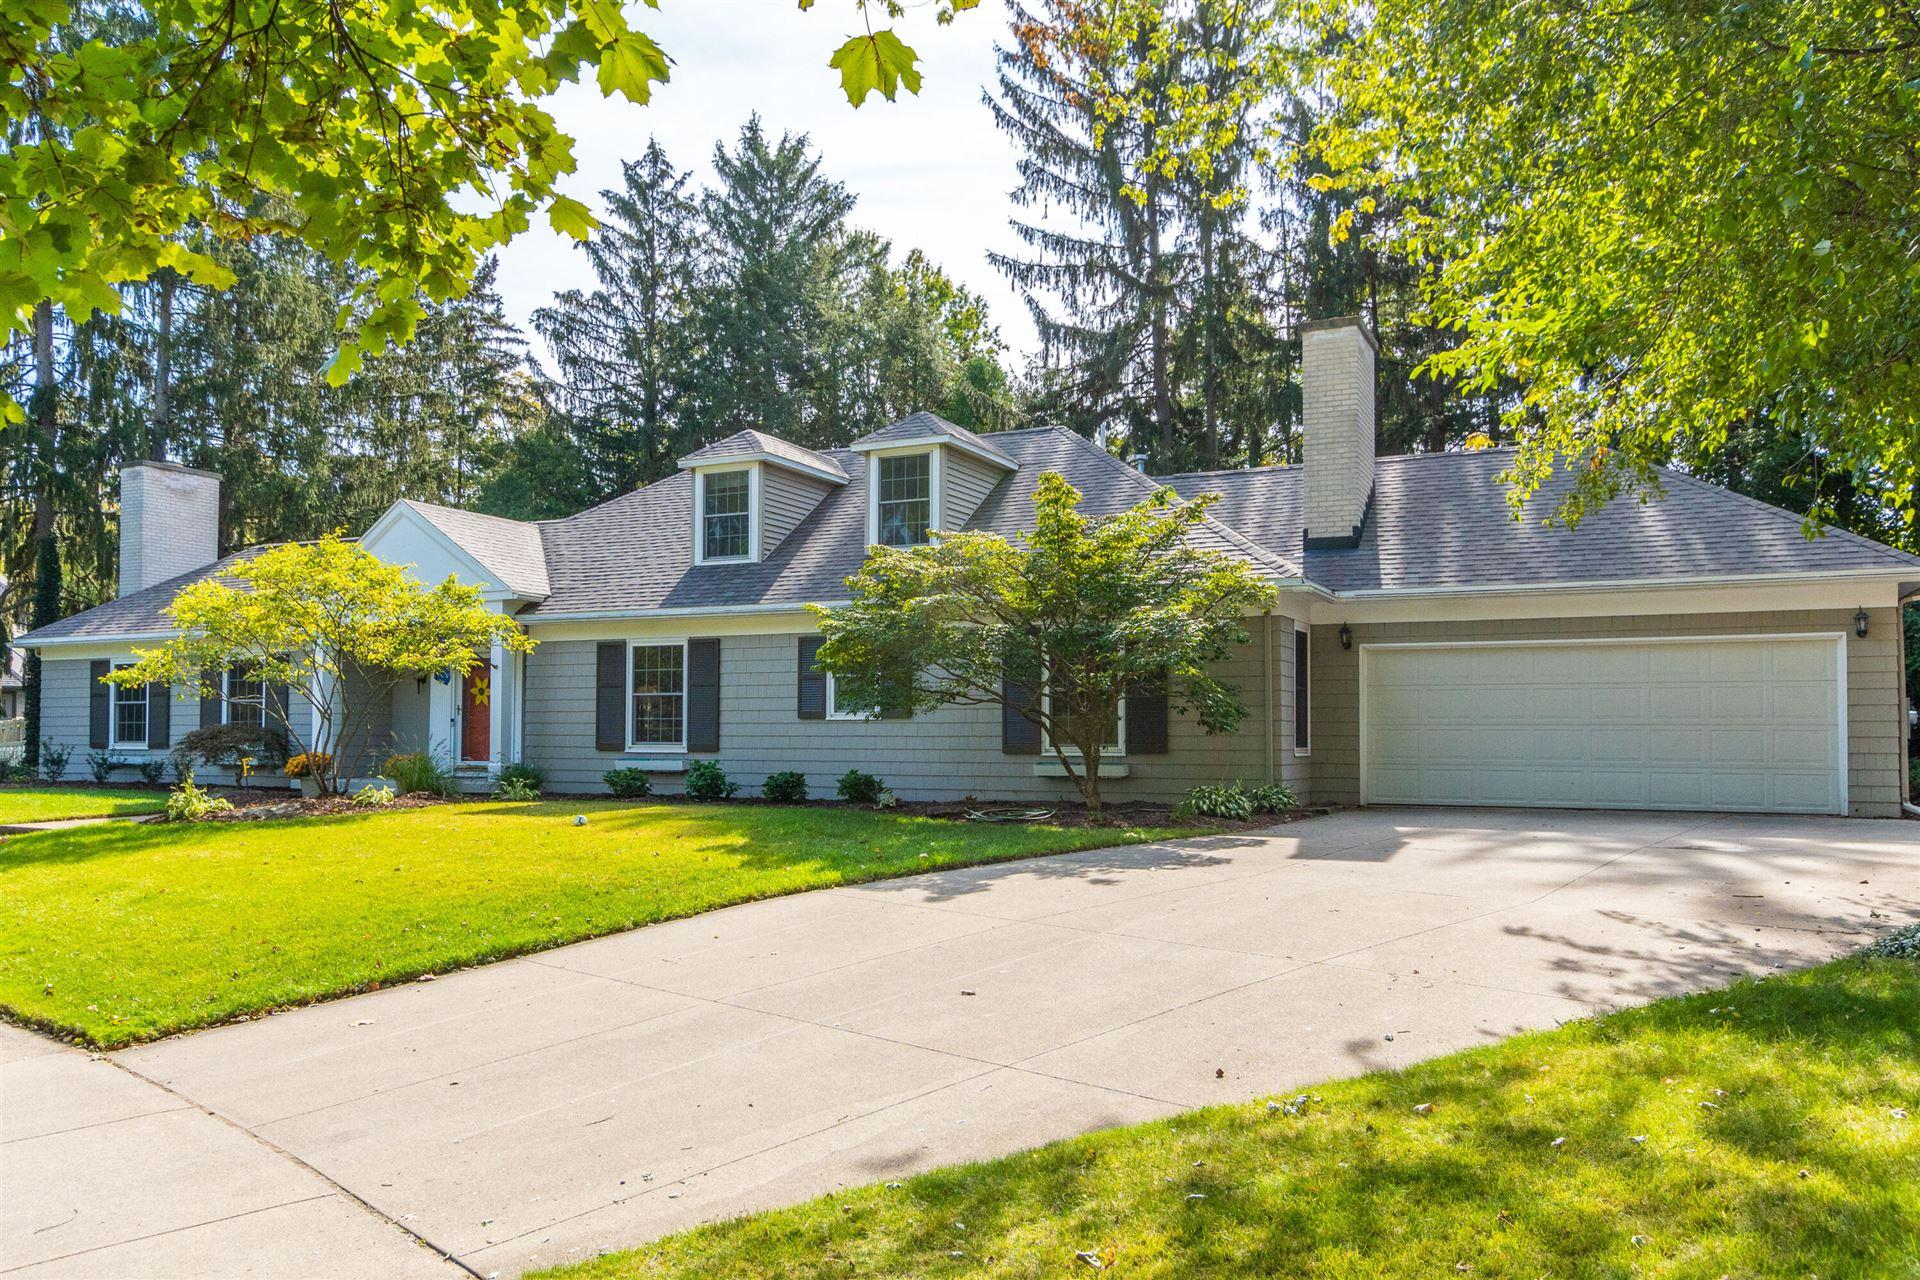 Photo of 536 Belvedere Drive SE, East Grand Rapids, MI 49506 (MLS # 21024874)